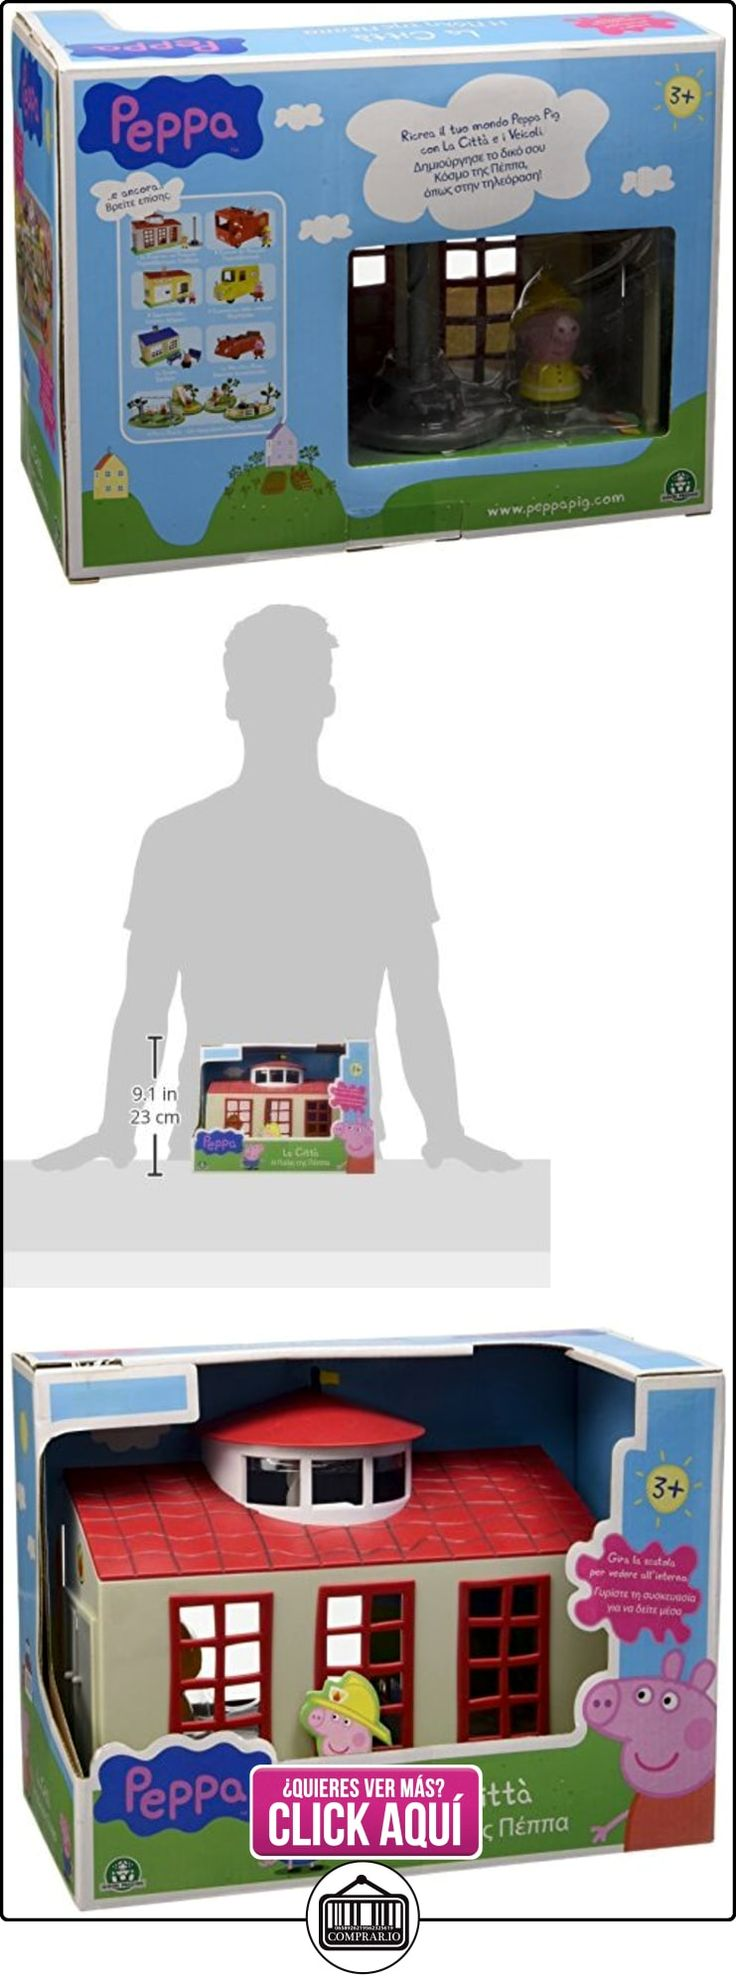 Giochi Preziosi - Casa de juguete, diseño de Peppa Pig  ✿ Peppa Pig - Peppa La Cerdita ✿ ▬► Ver oferta: https://comprar.io/goto/B00HDPN2EQ